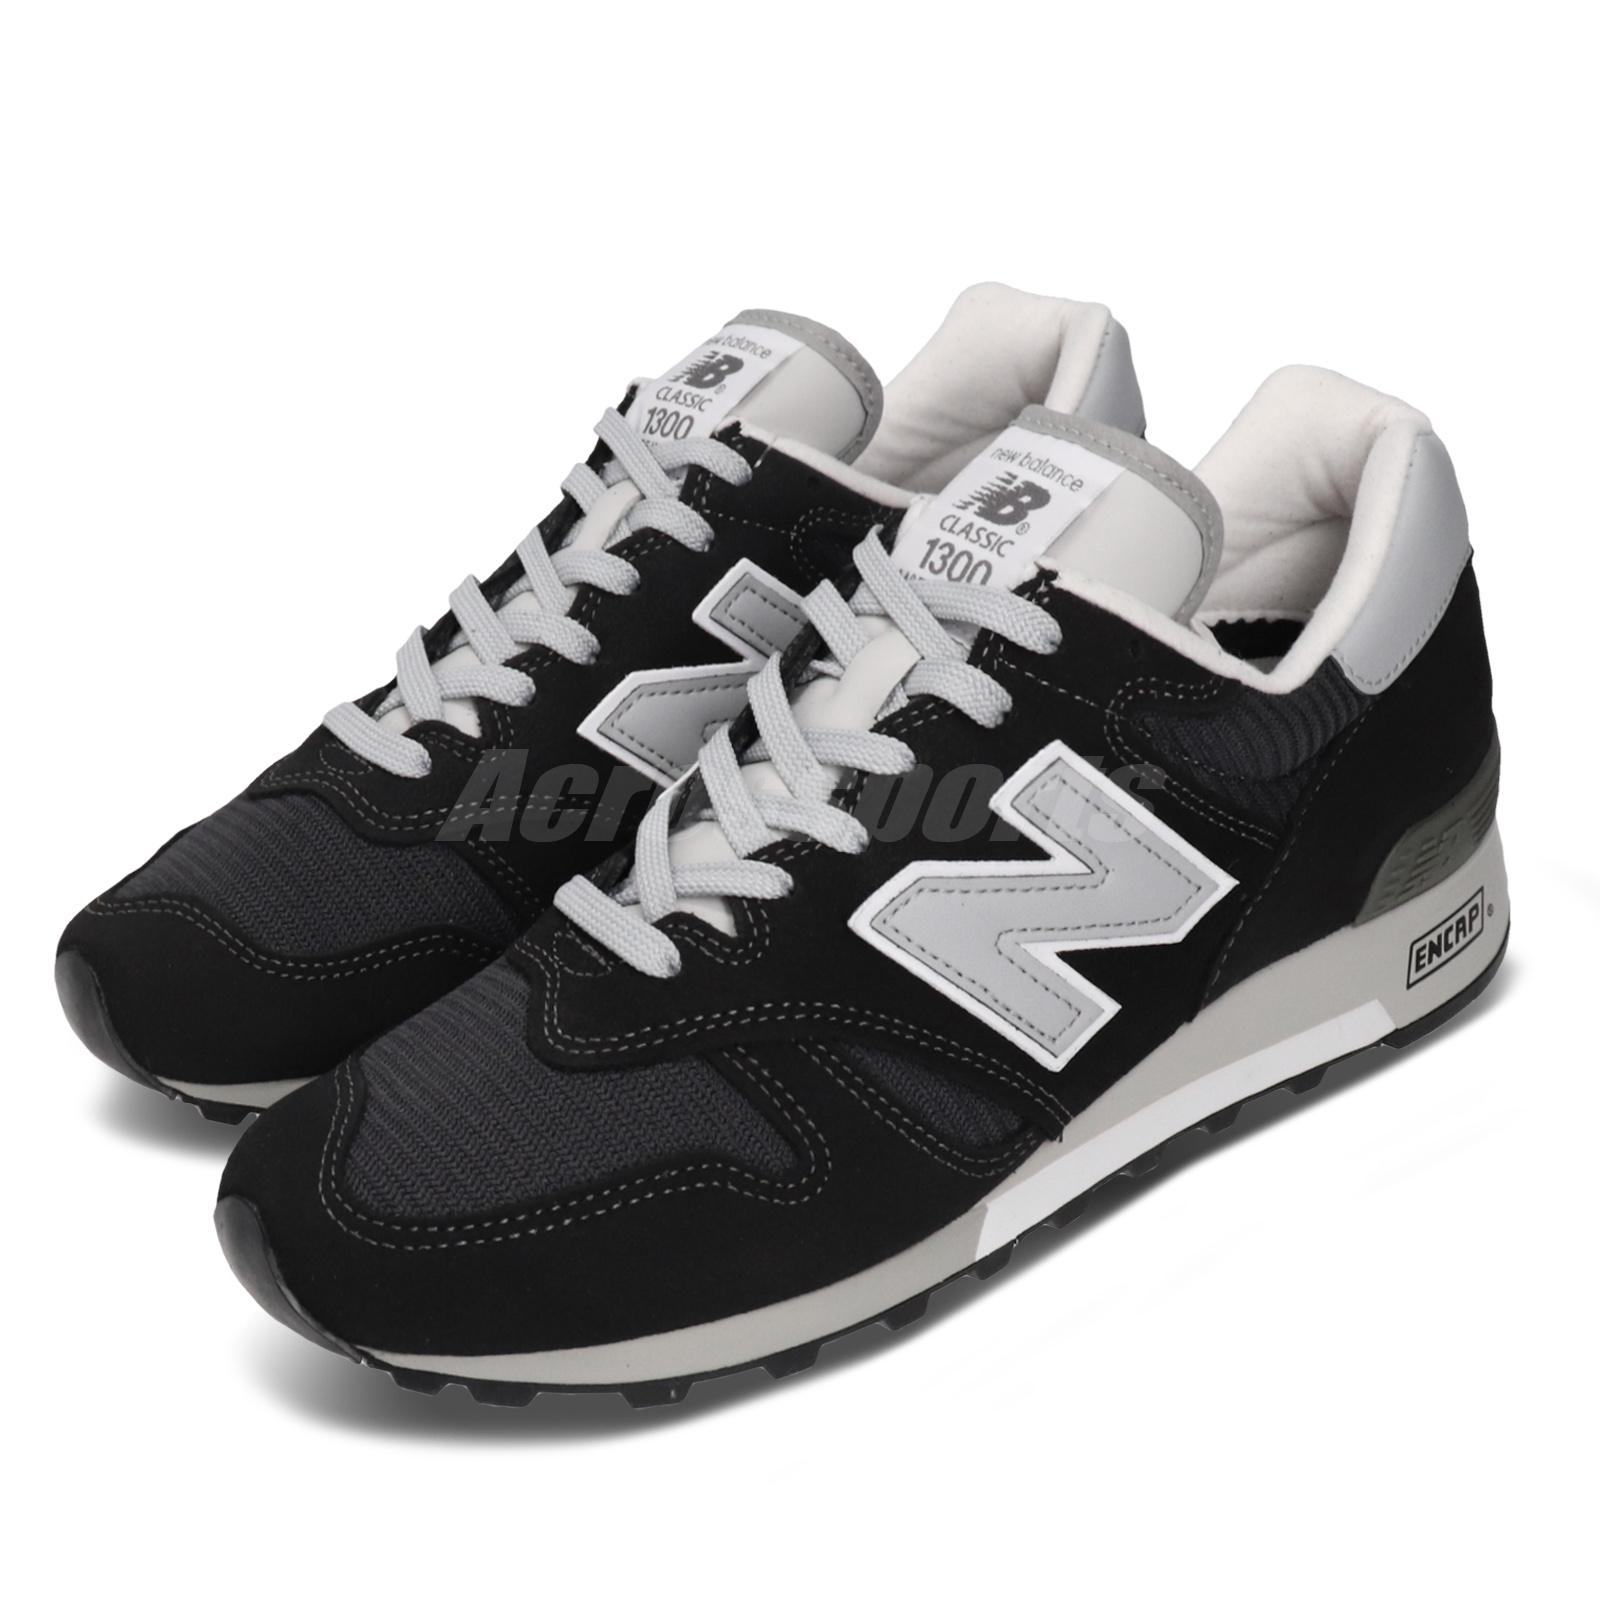 New balance 1300 Negro Gris Gamuza